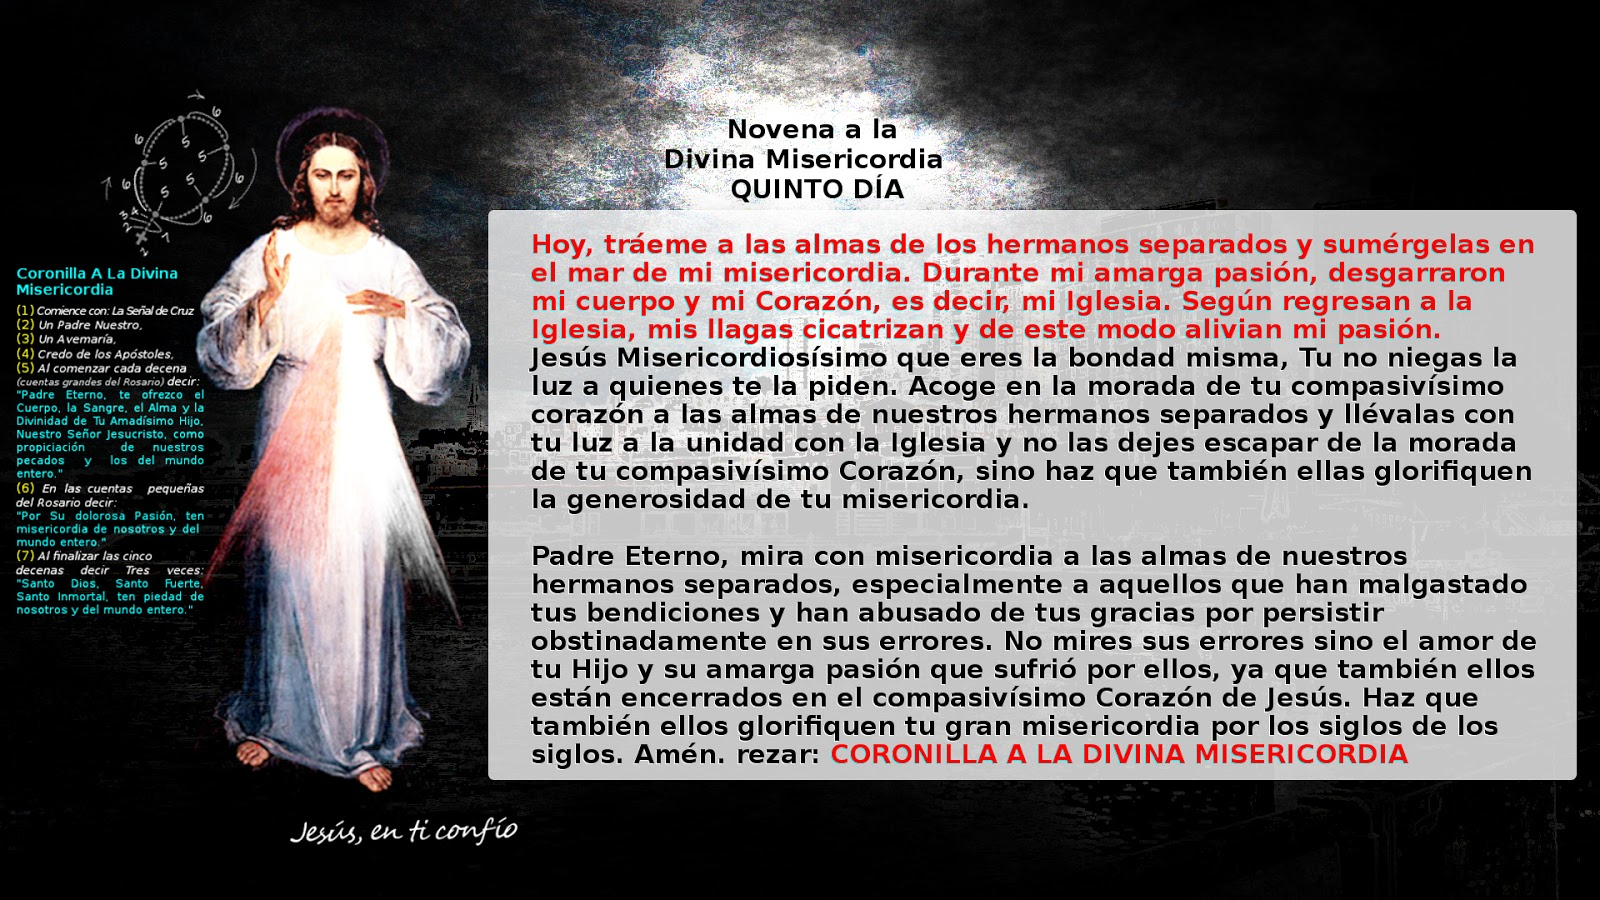 fotos con nevena divina misericordia 2017 quinto dia